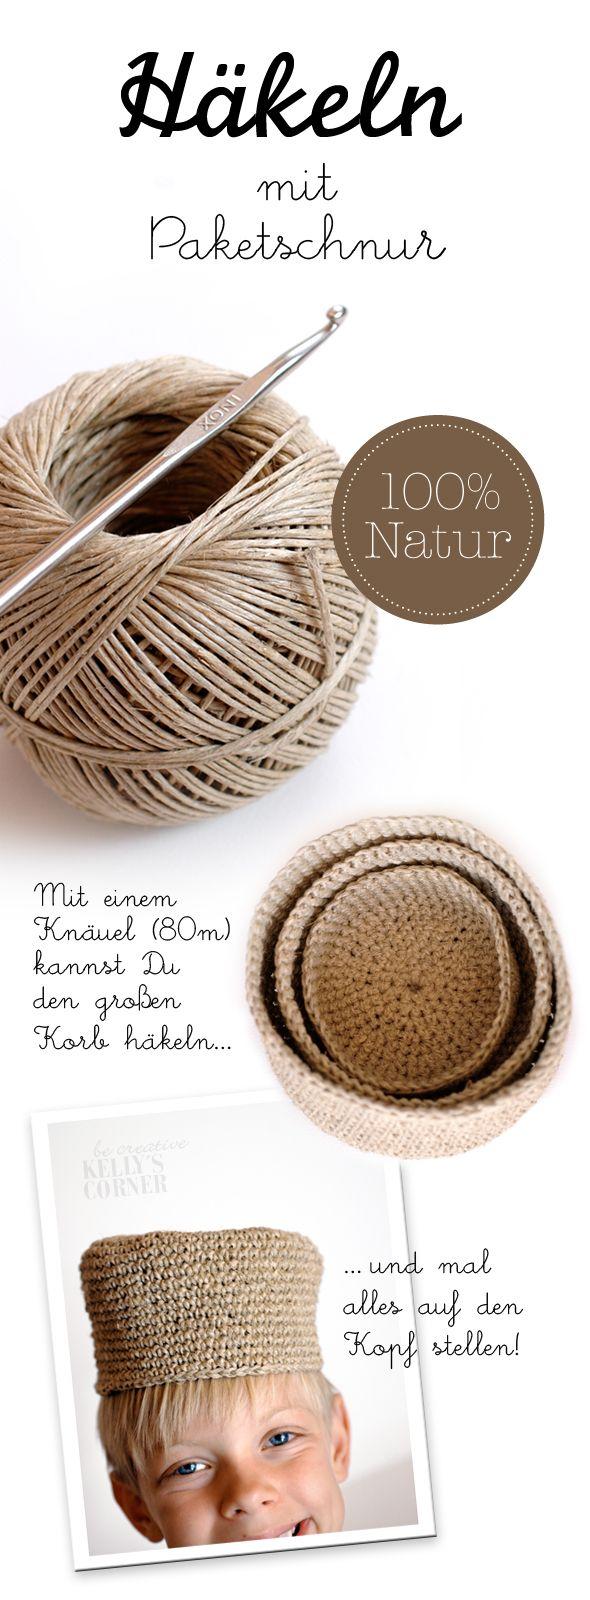 282 best Häkeln images on Pinterest | Crochet patterns, Hand crafts ...